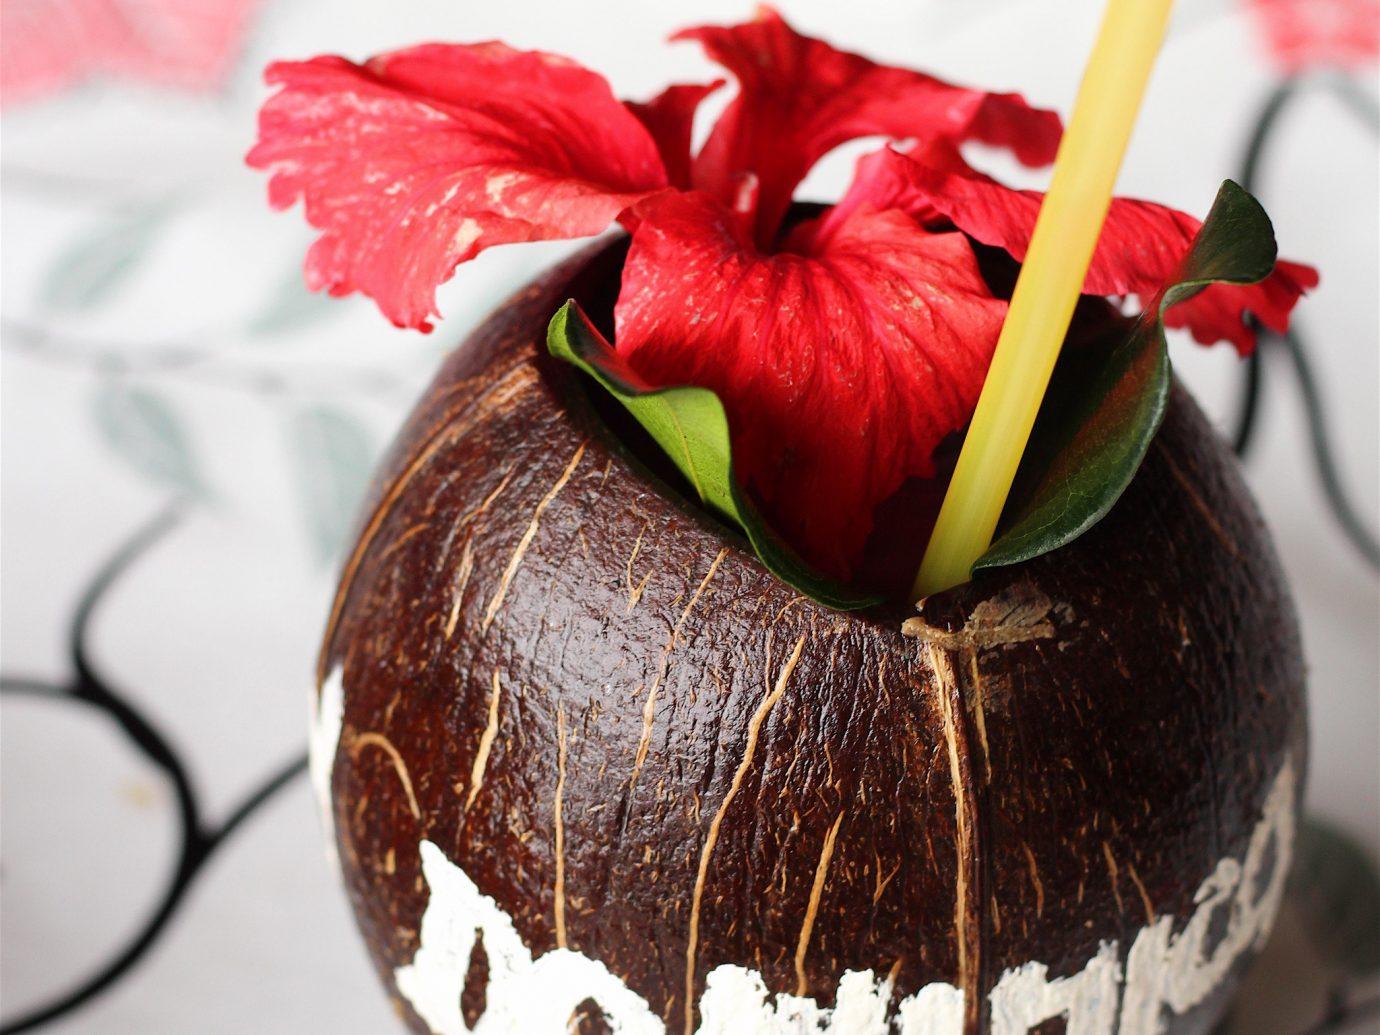 Trip Ideas plant food produce decorated dessert flavor